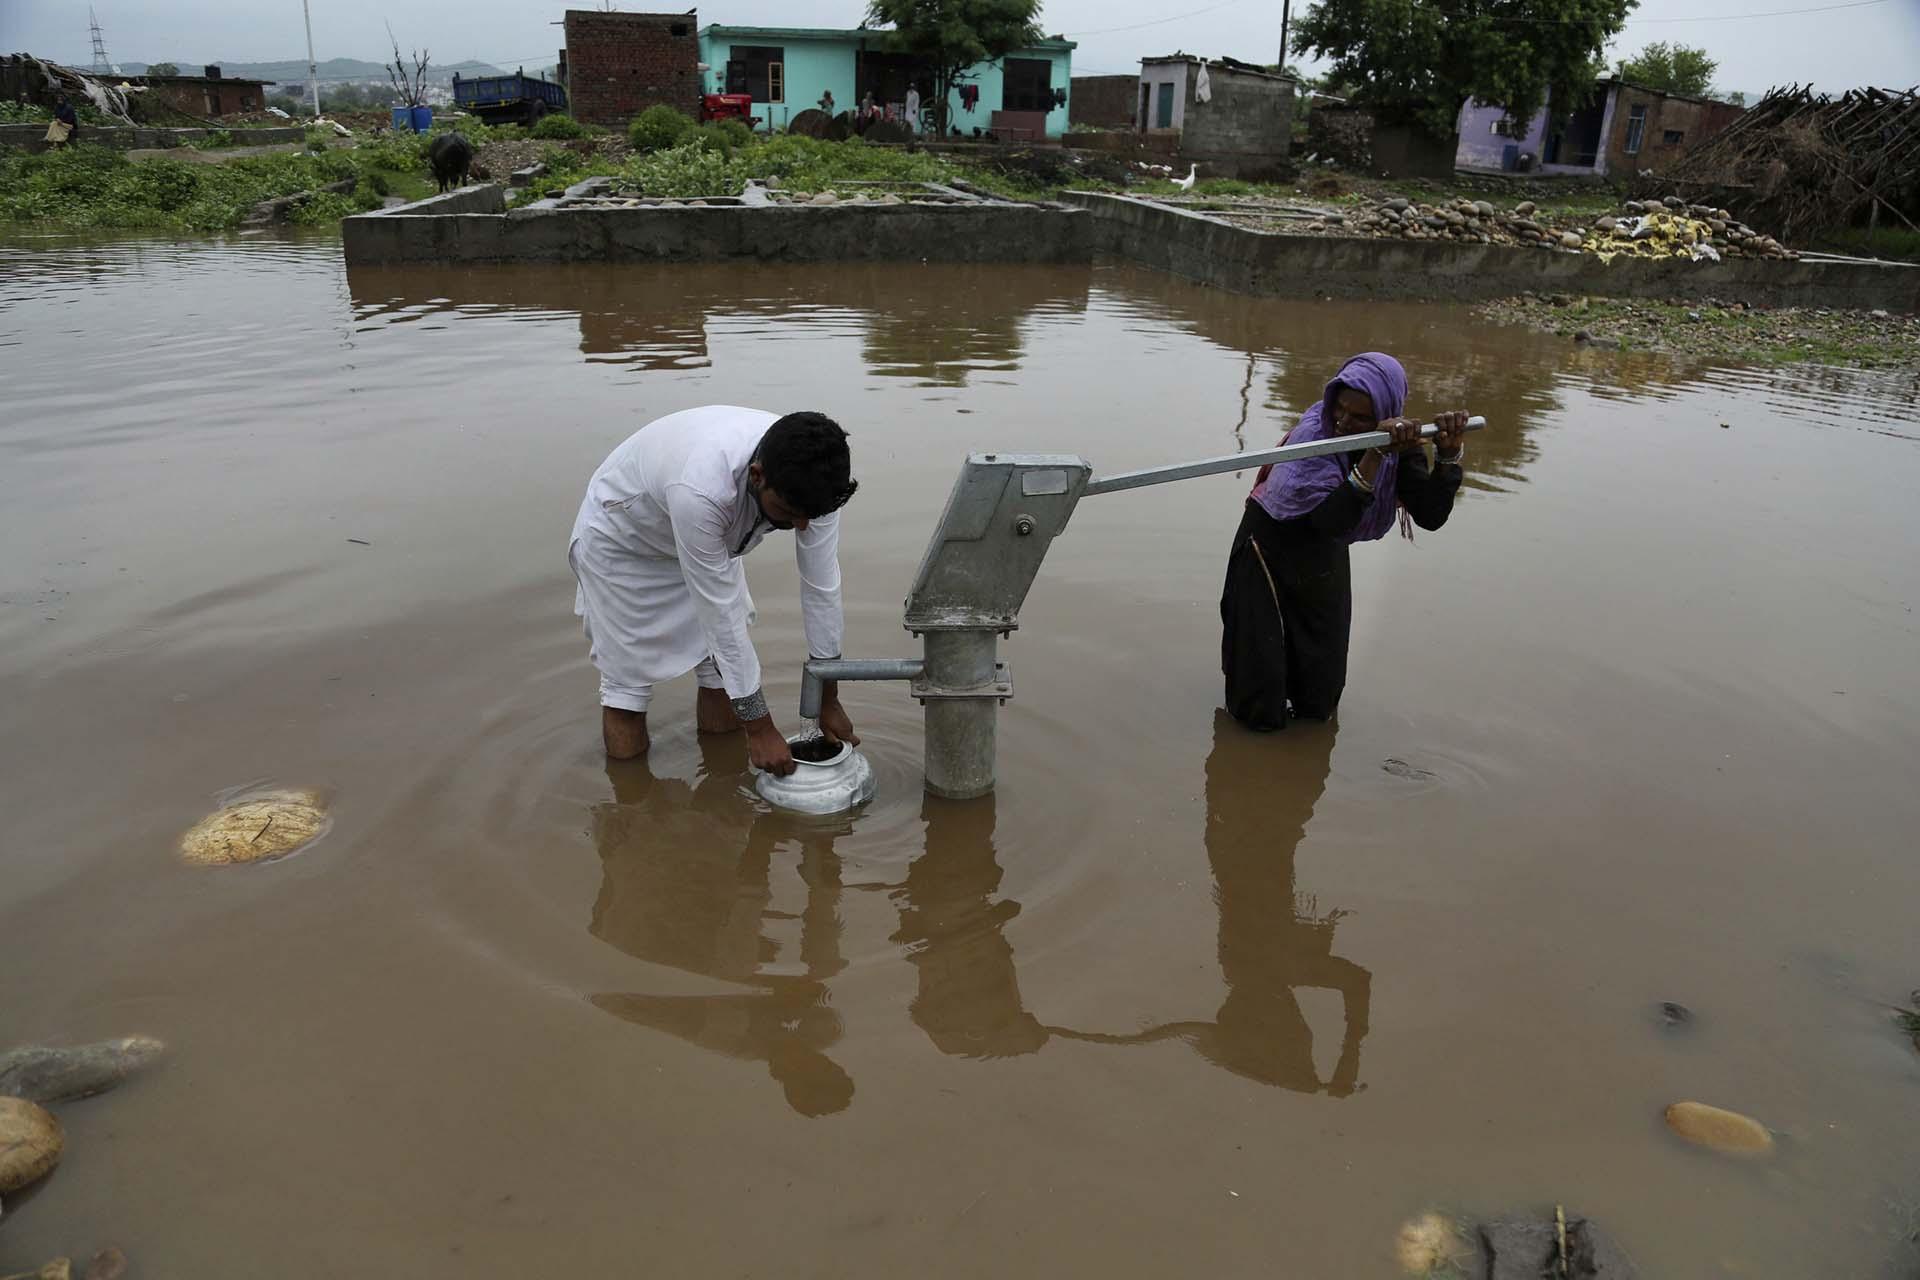 Una pareja recolecta agua potable en Jammu, India (AP Photo/Channi Anand)